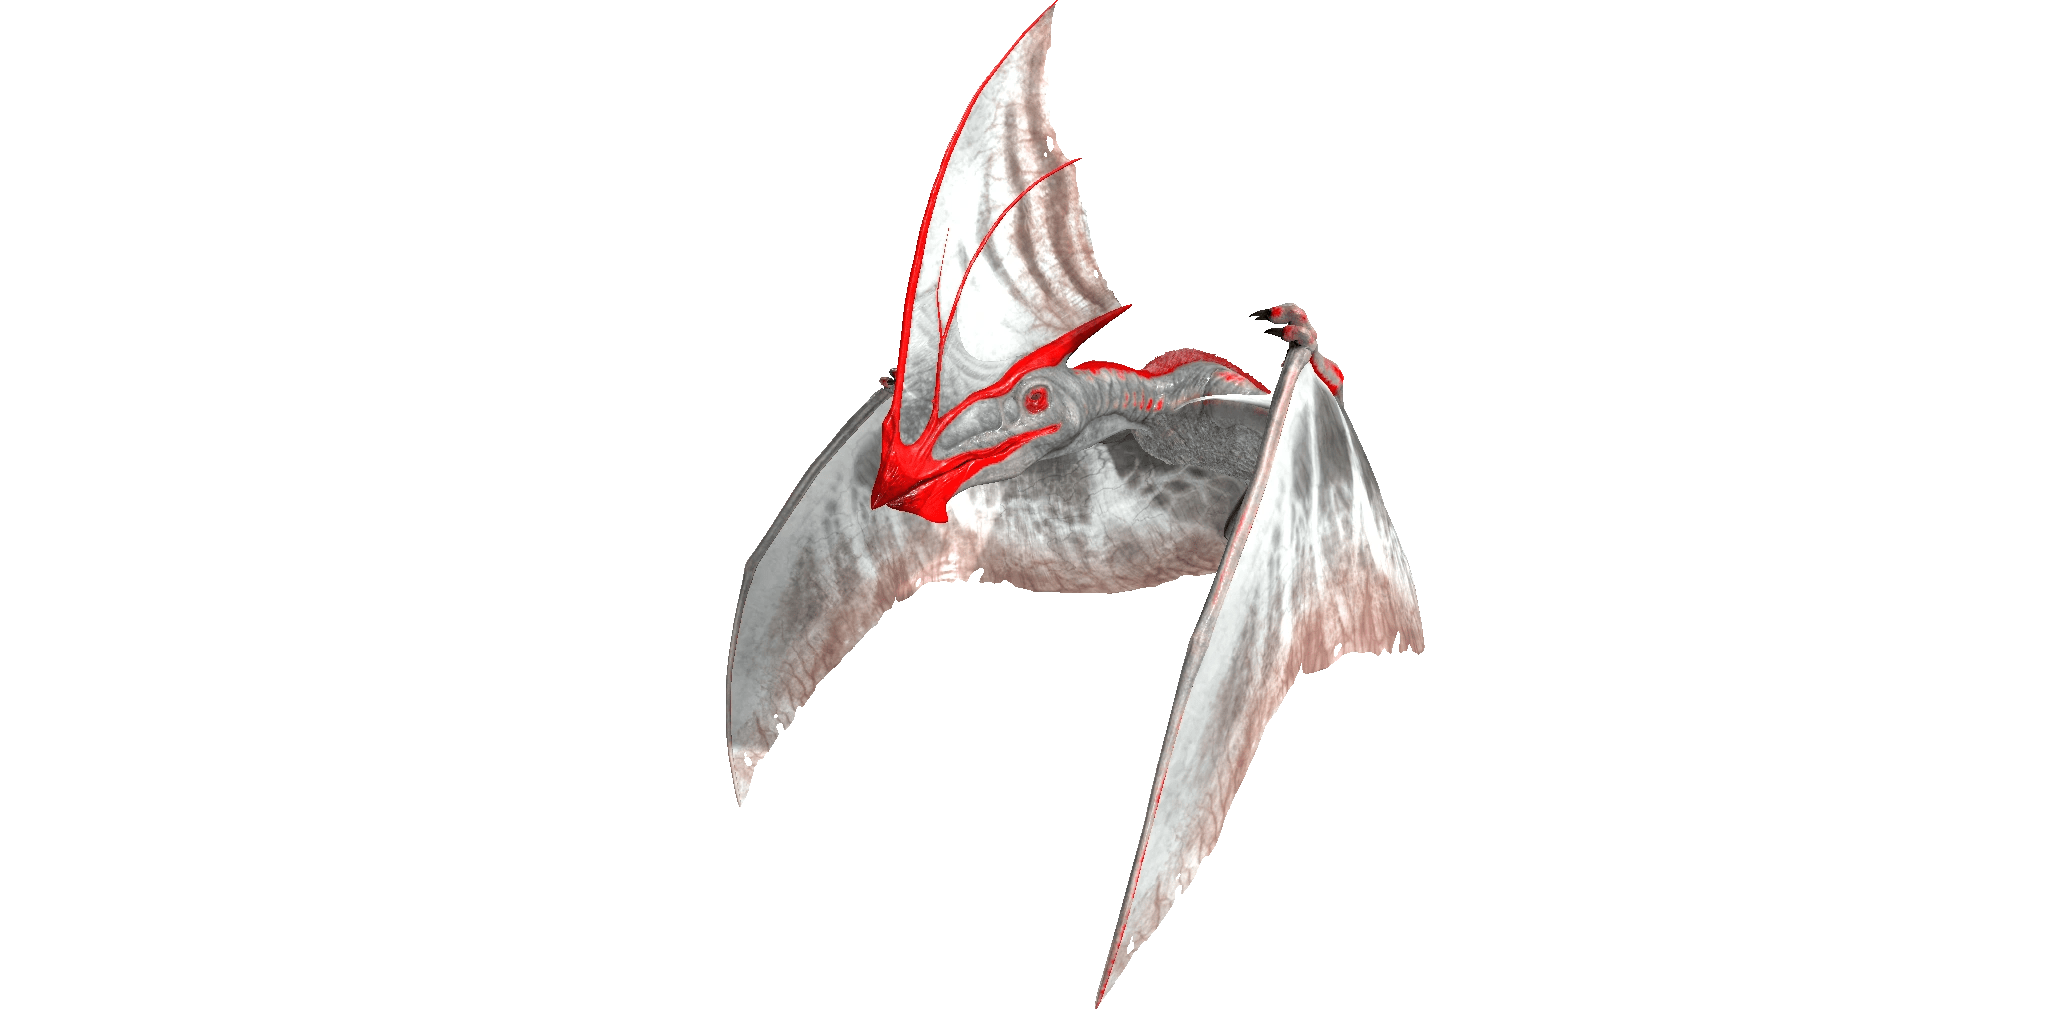 Tapejara Official ARK Survival Evolved Wiki